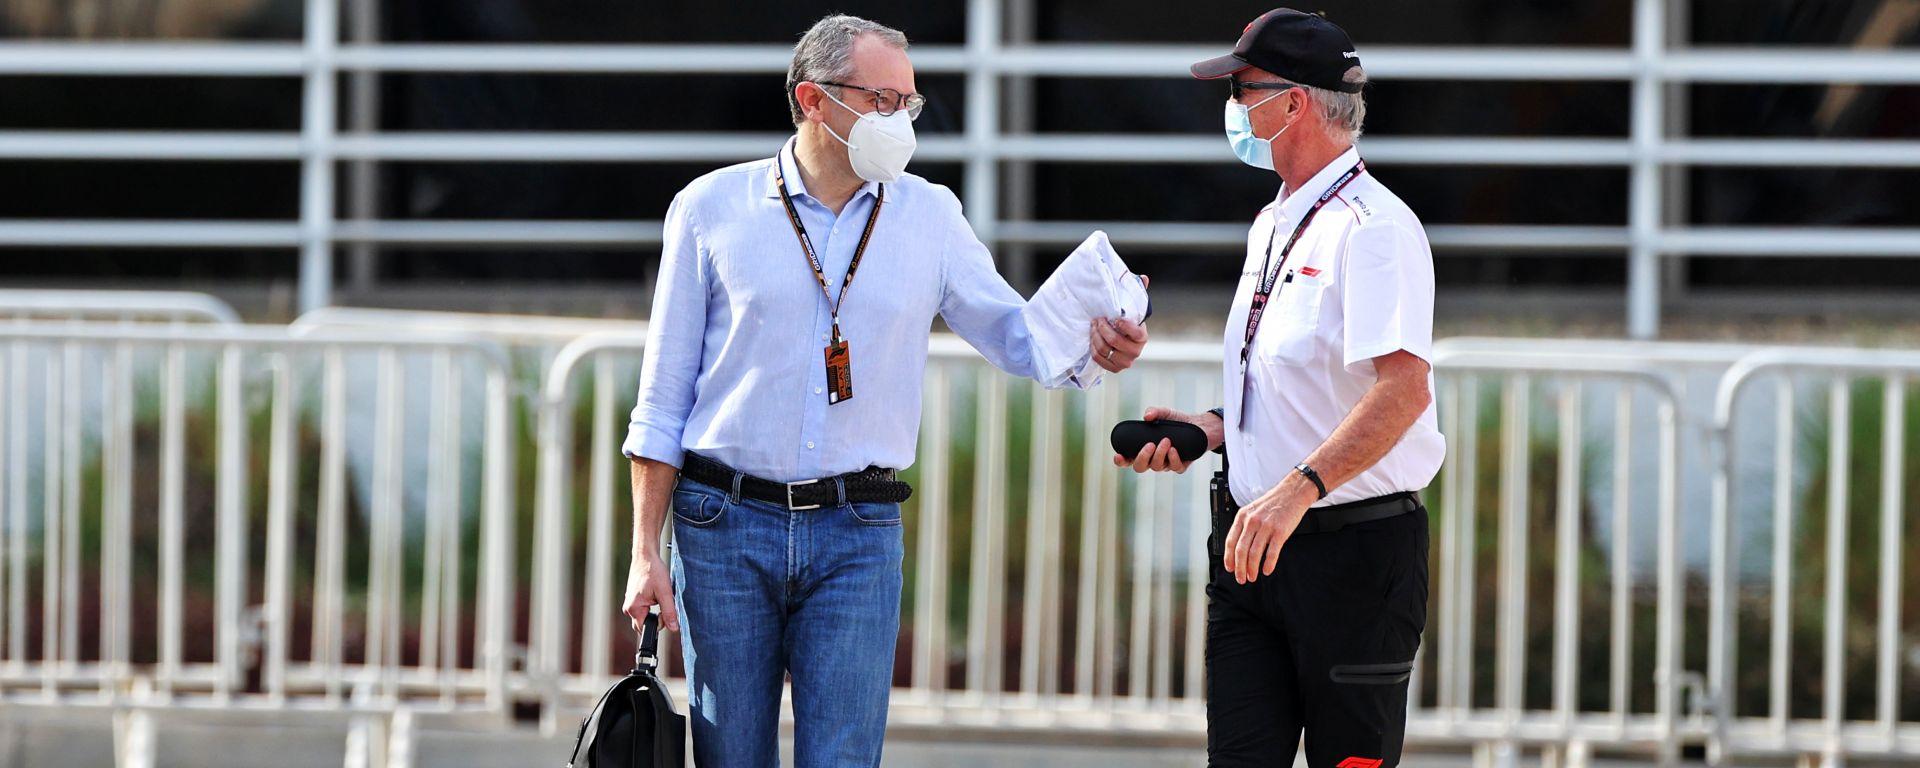 F1 Test Bahrain 2021, Sakhir: Stefano Domenicali (Liberty Media)